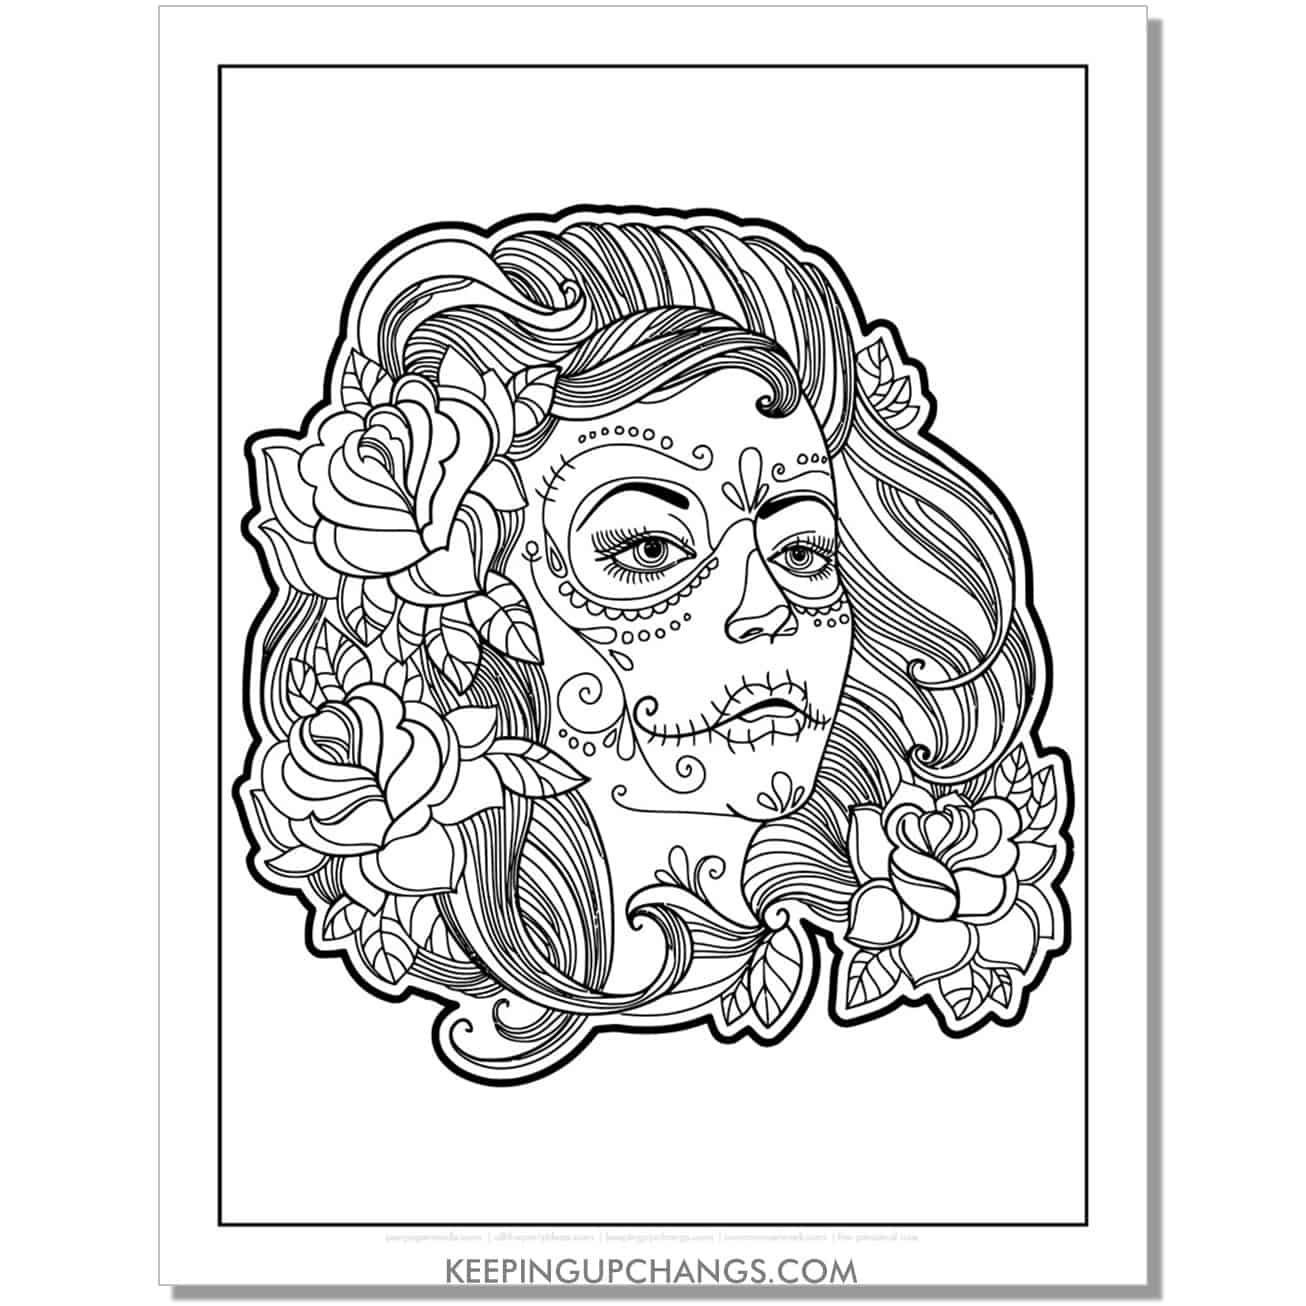 dia de los muertas girl with roses coloring page.